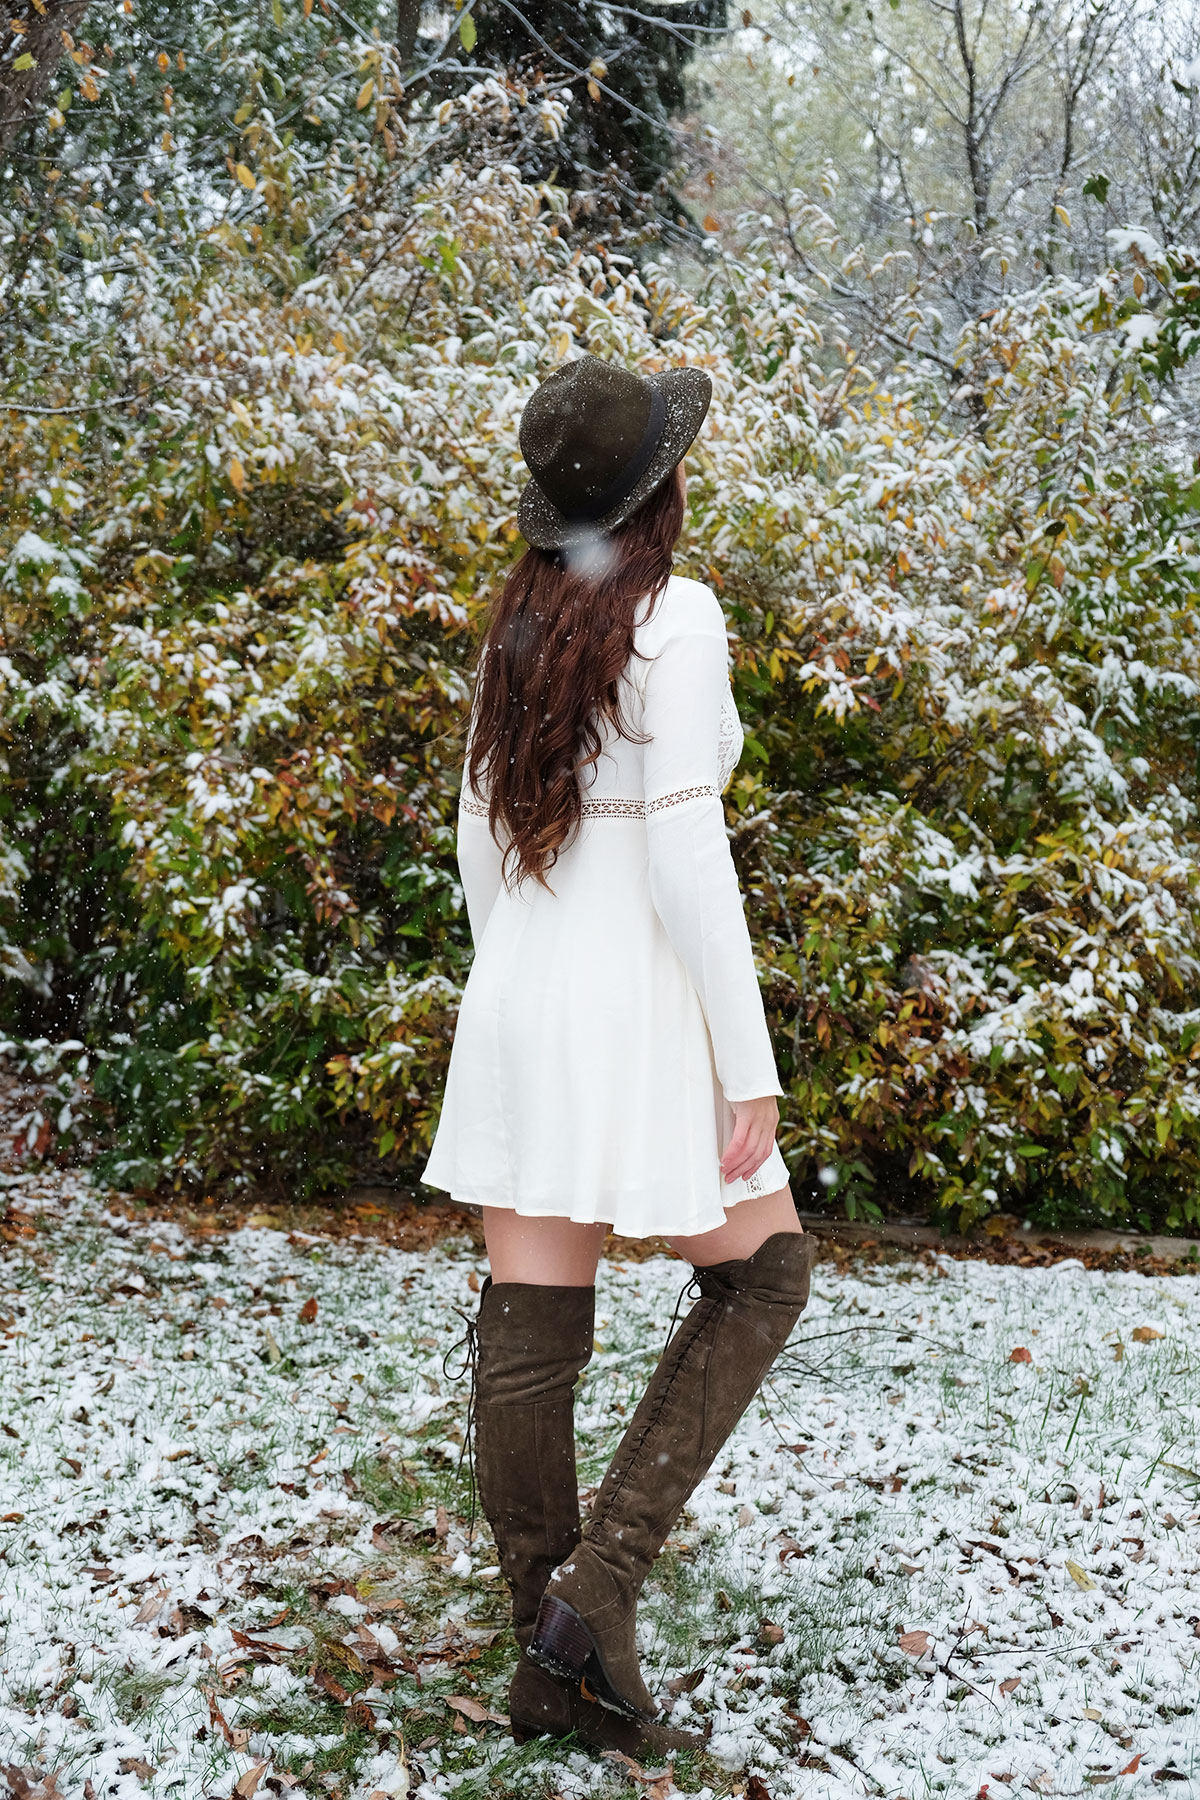 snow_6_sml.jpg